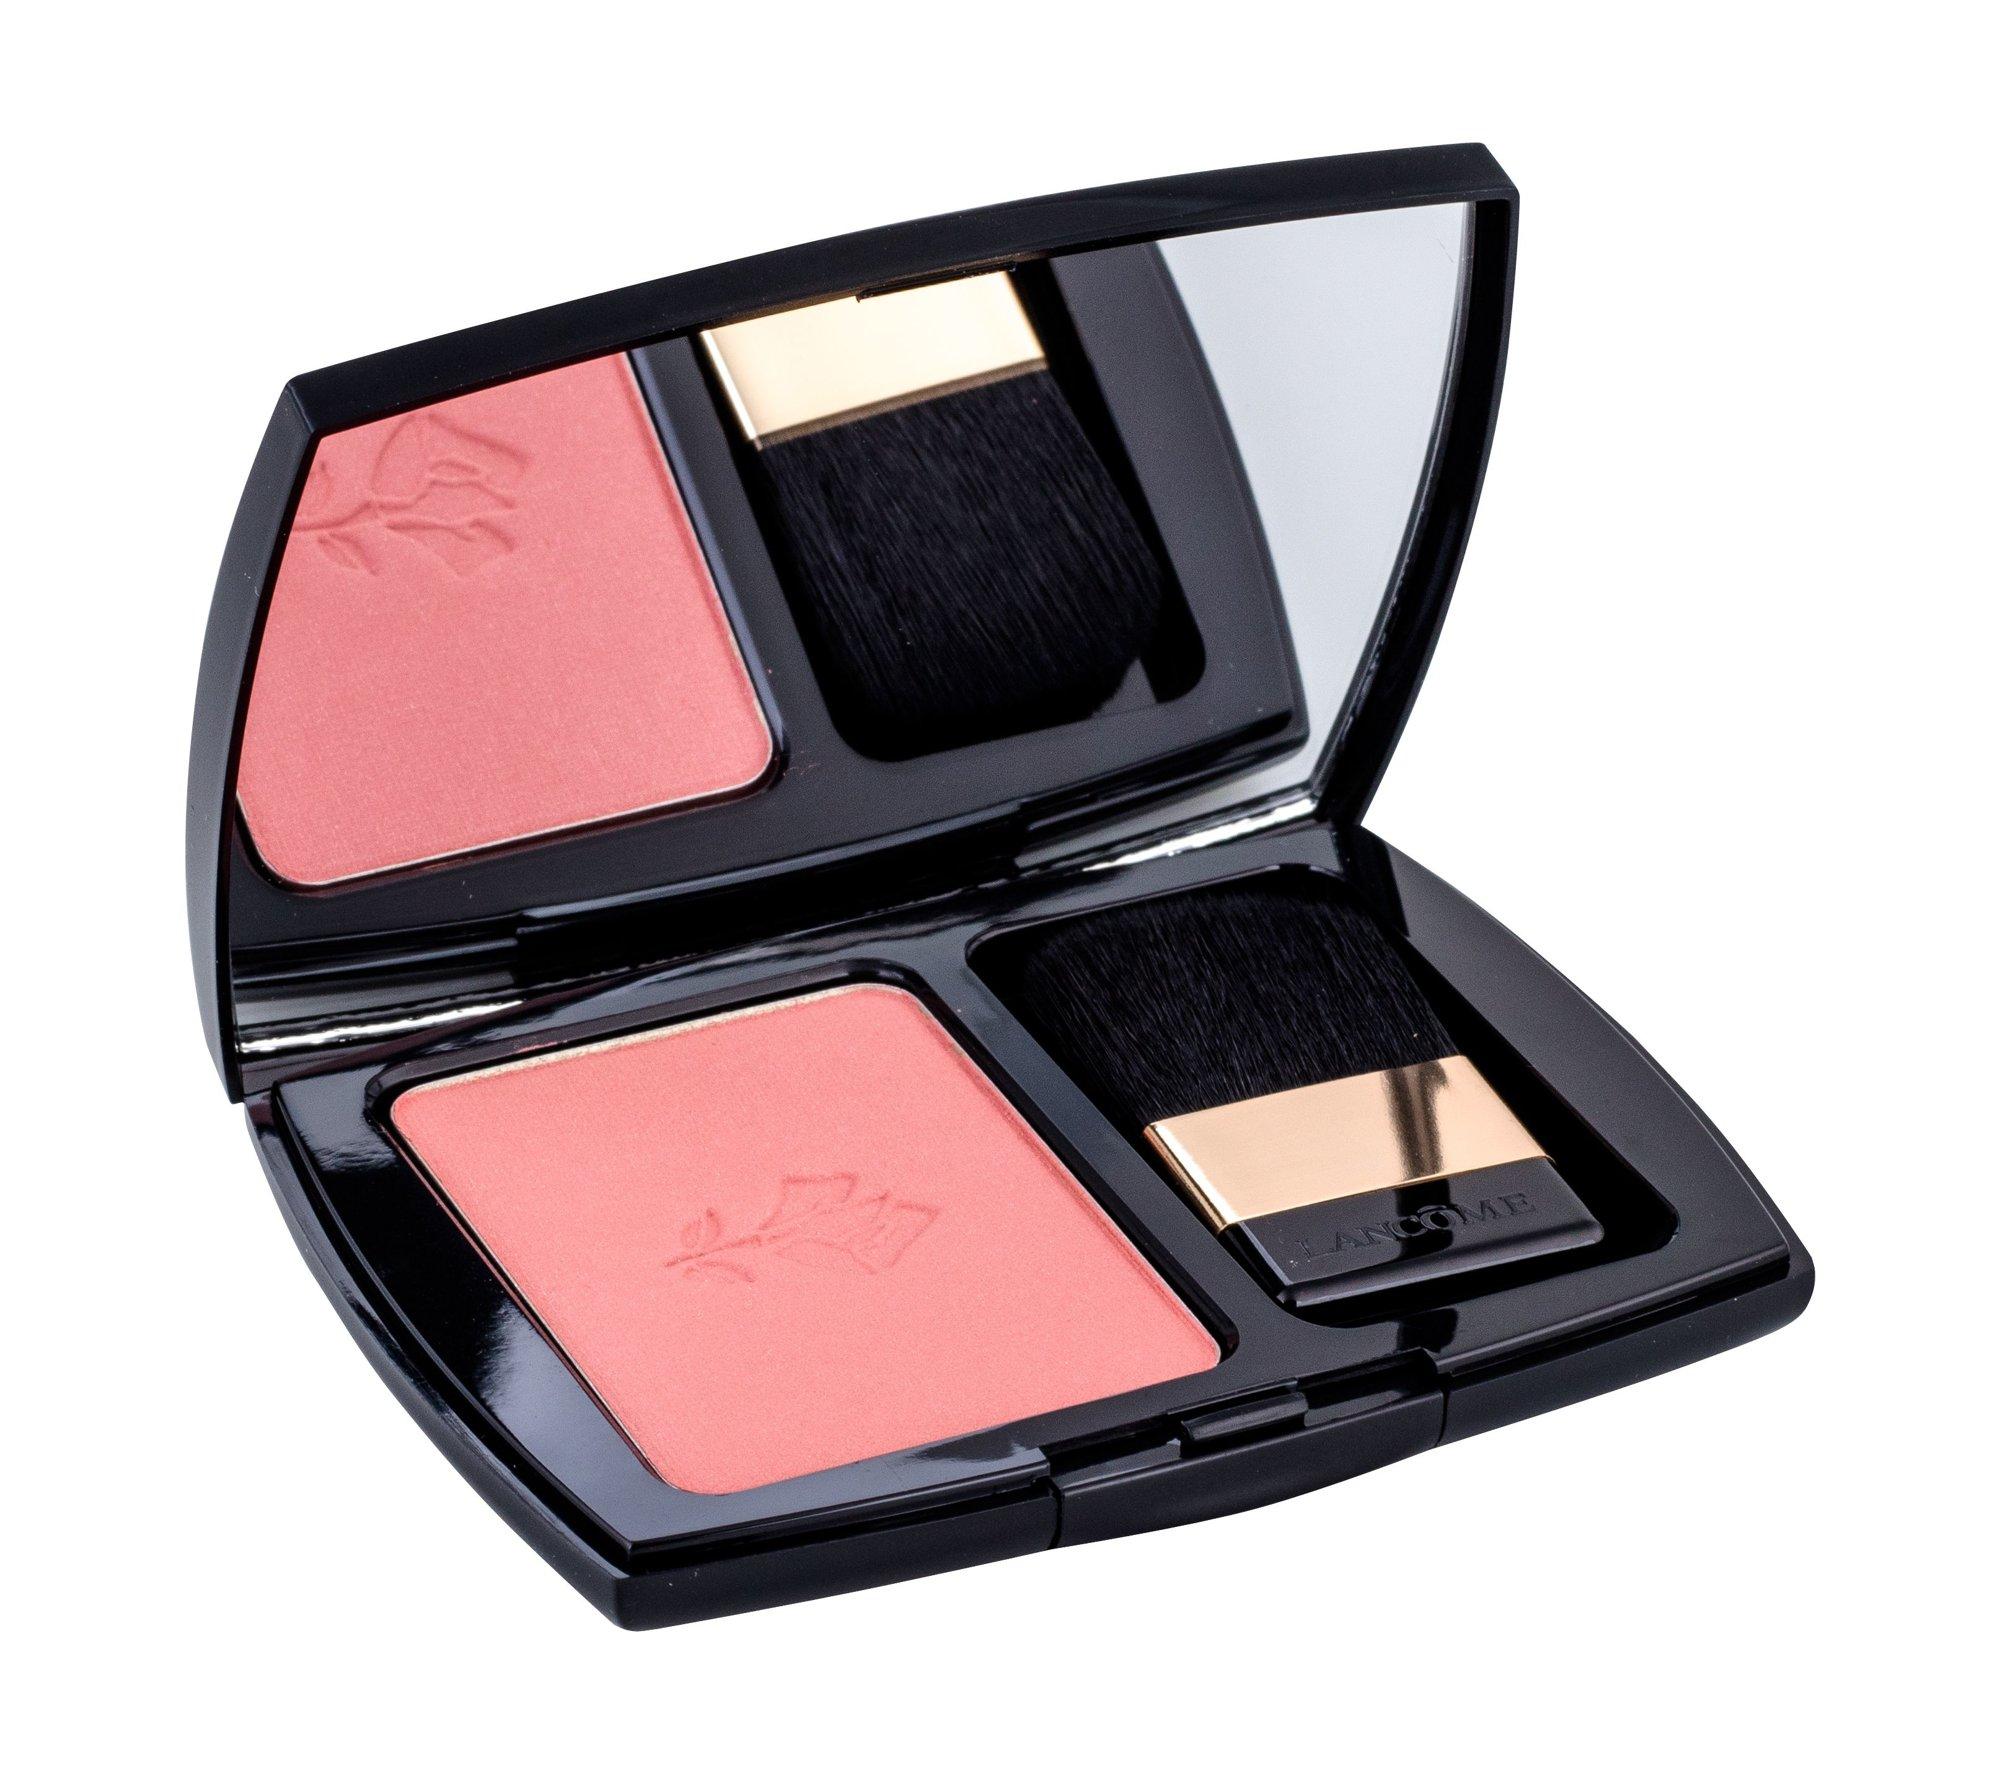 Lancôme Blush Subtil Cosmetic 6ml 02 Rose Sable